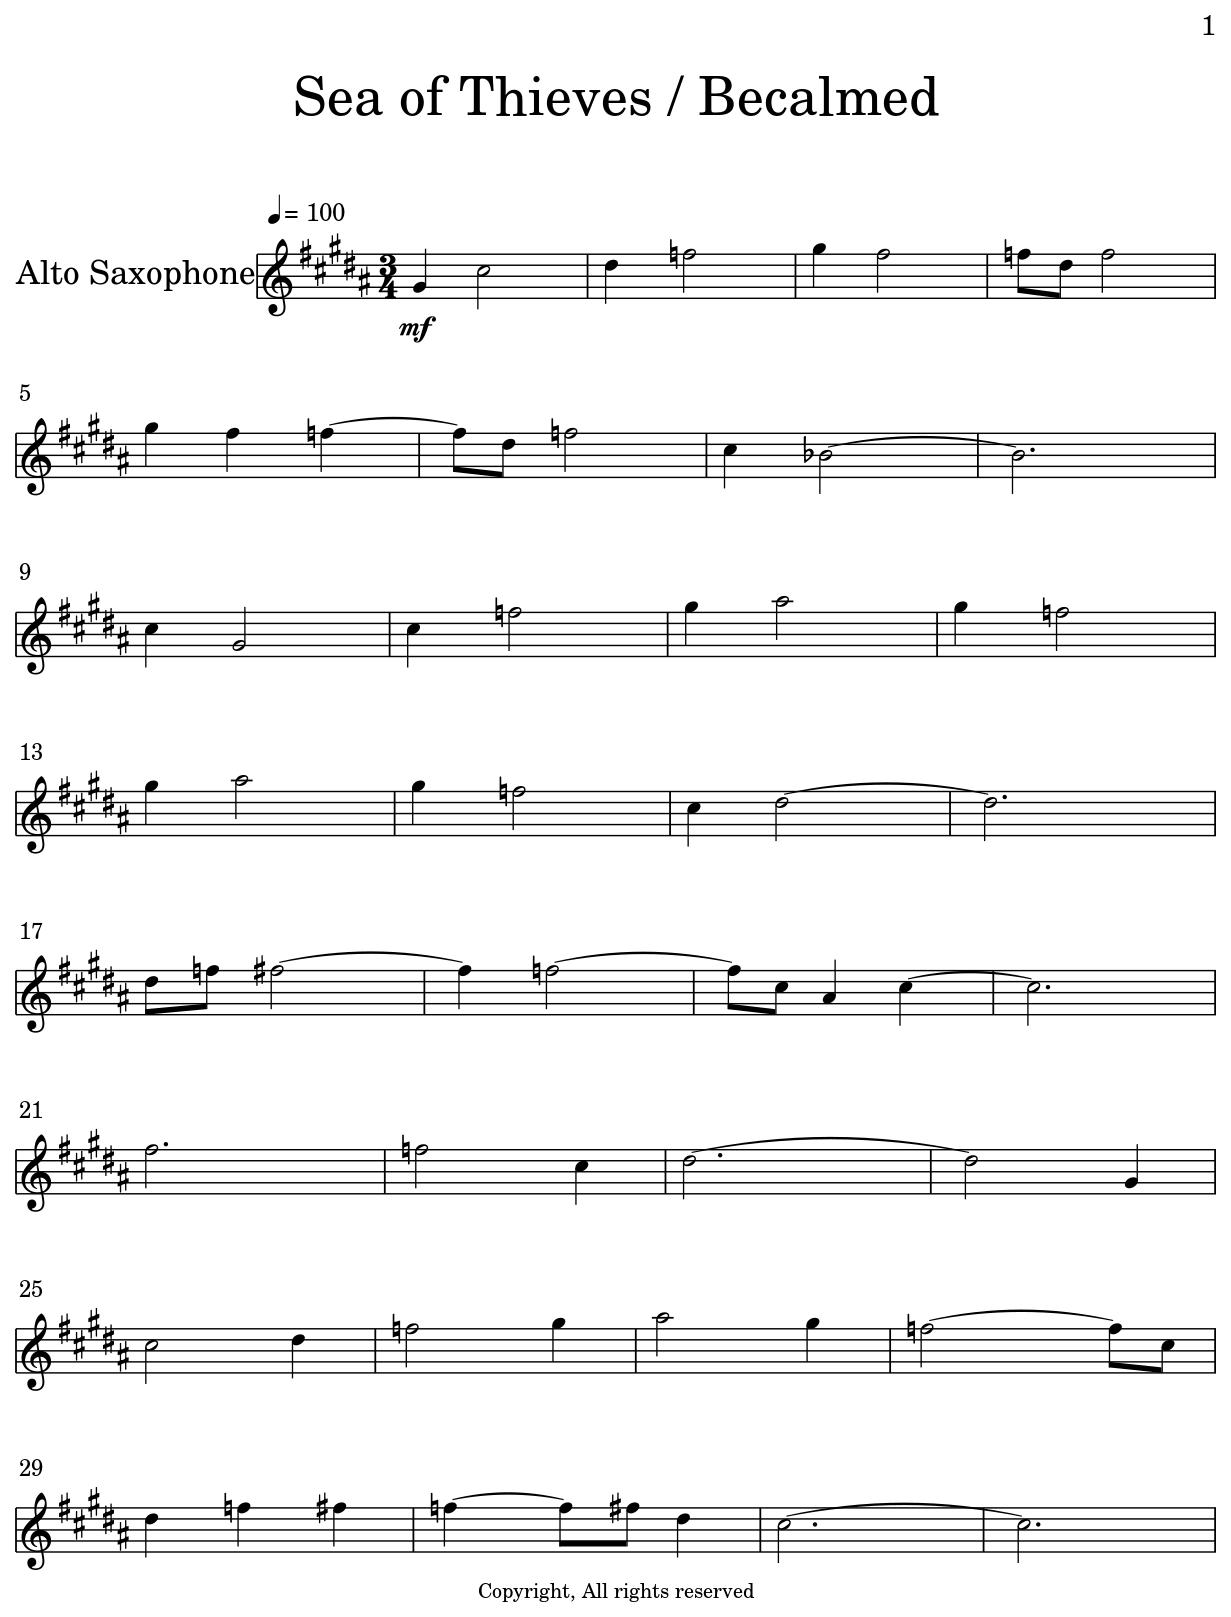 Sea Of Thieves Sheet Music : thieves, sheet, music, Thieves, Becalmed